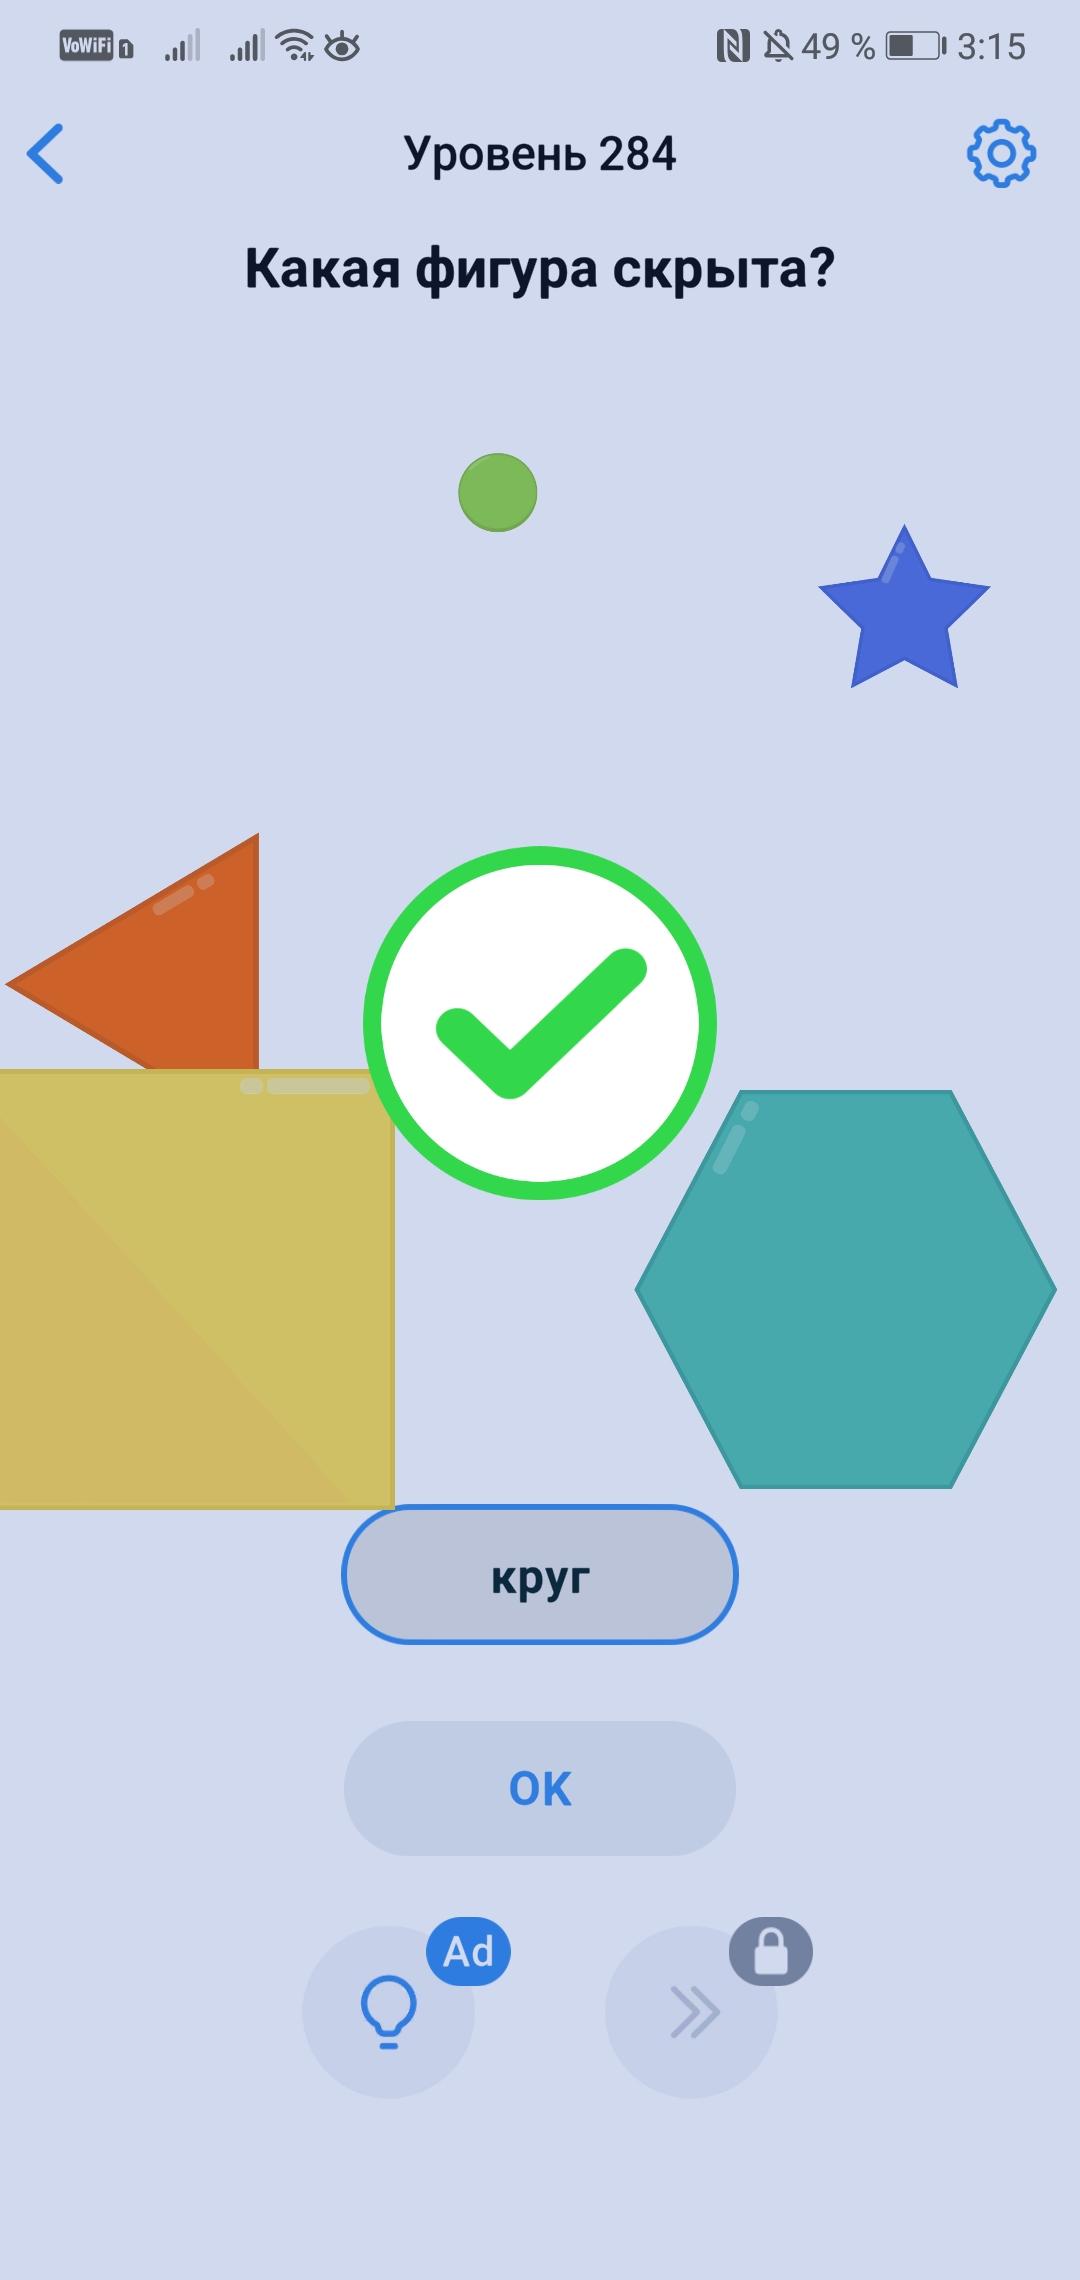 Easy Game - 284 уровень - Какая фигура скрыта?